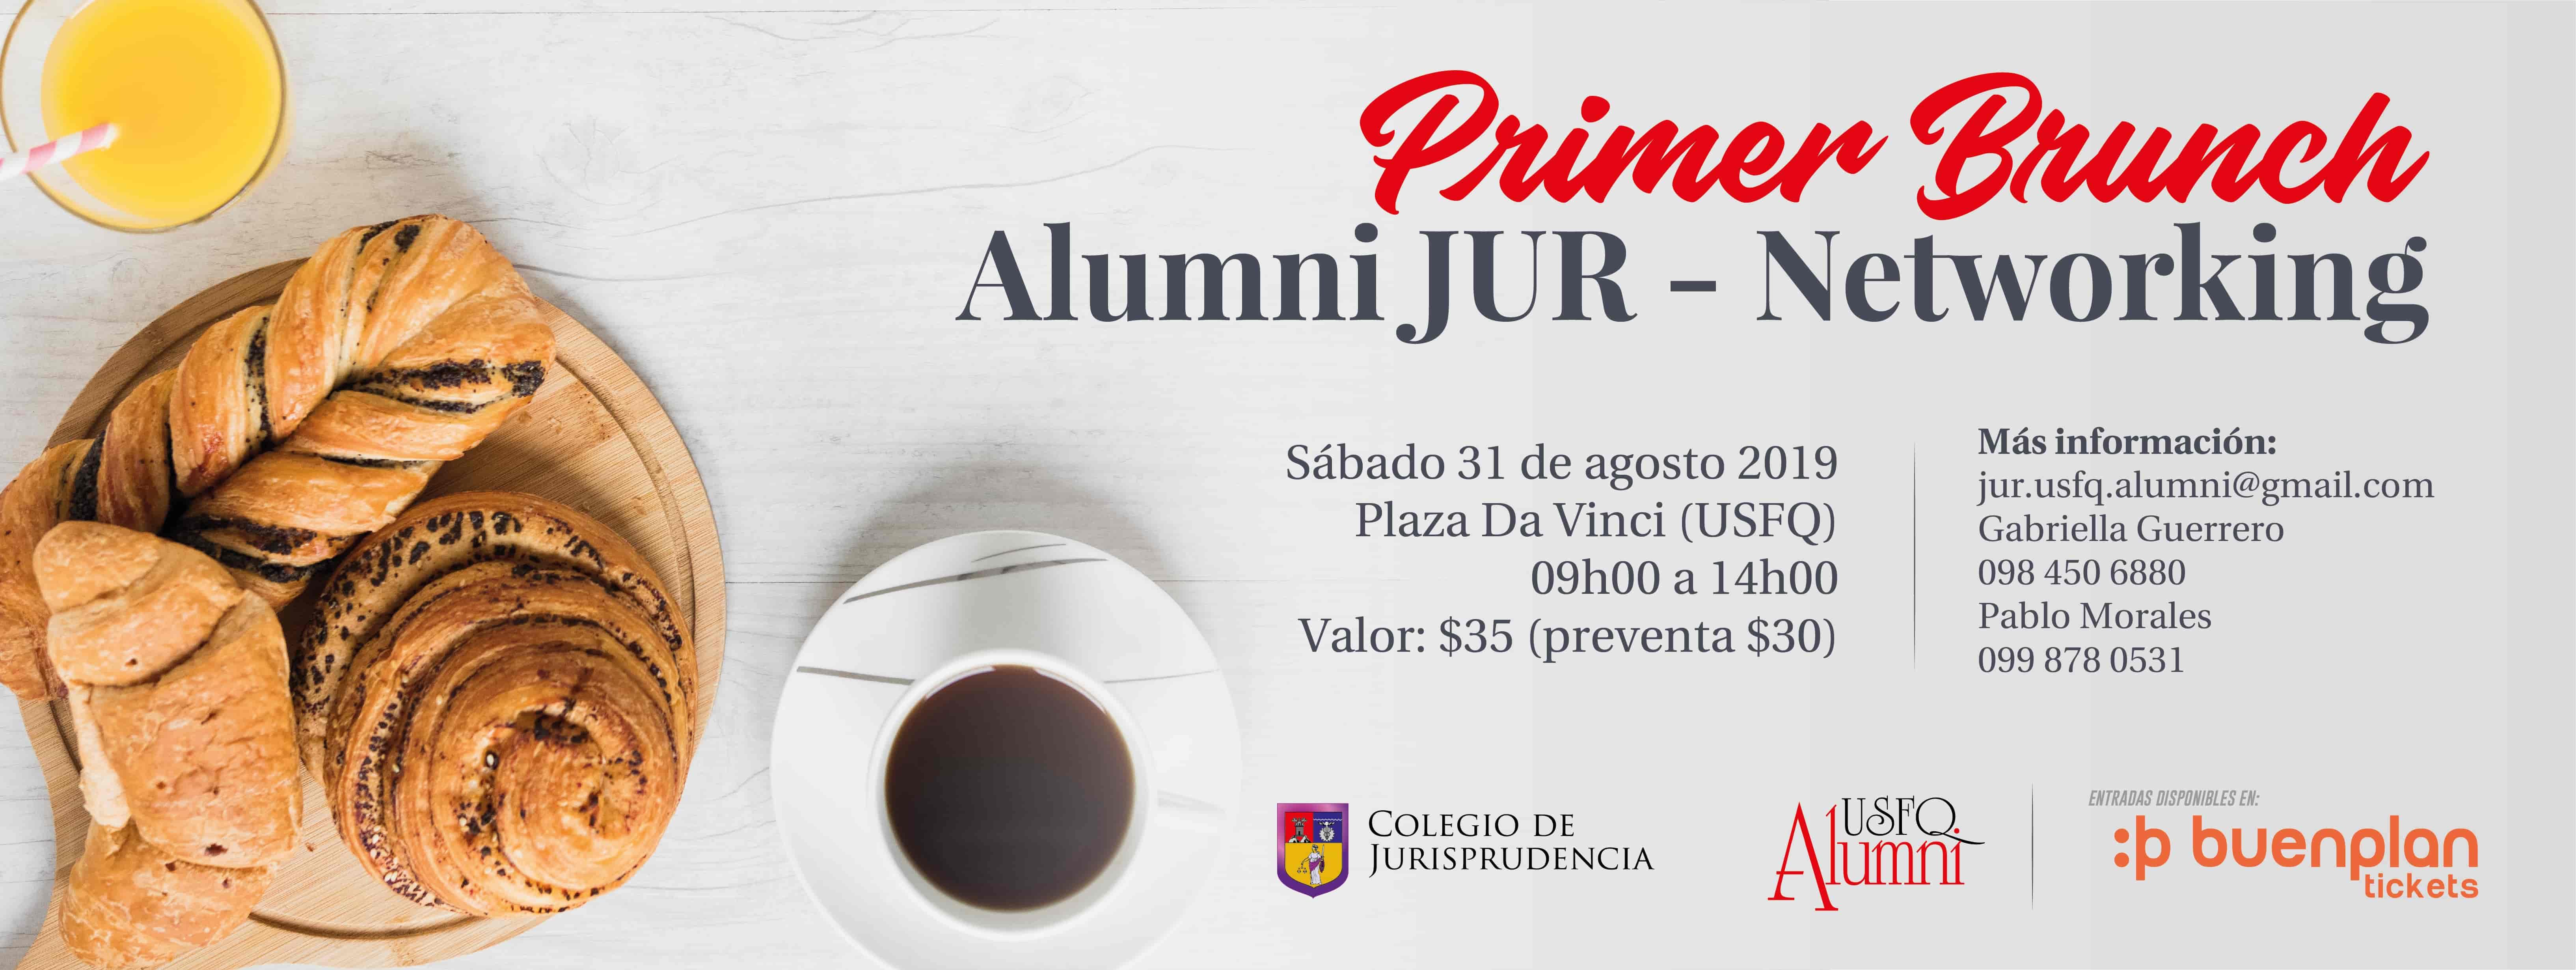 USFQ Alumni JUR Brunch- Networking en Quito, BuenPlan